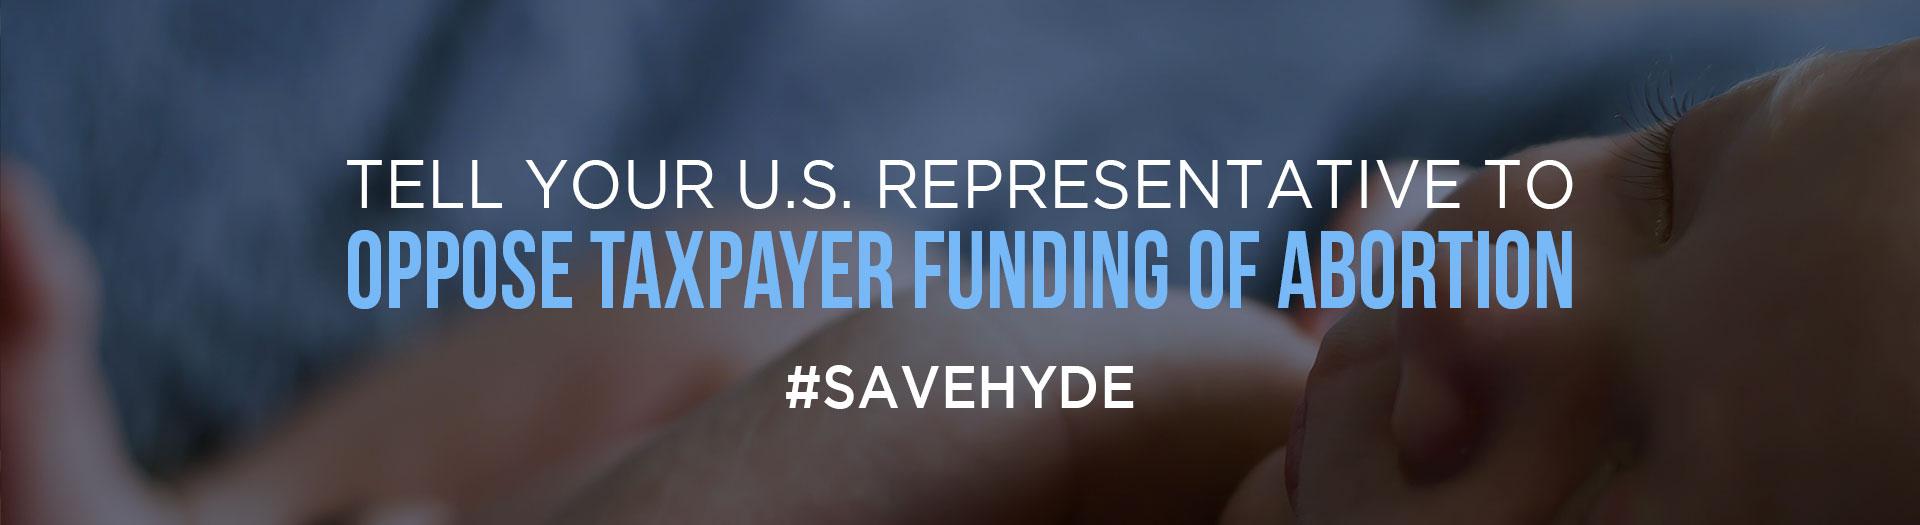 Save the Hyde Amendment